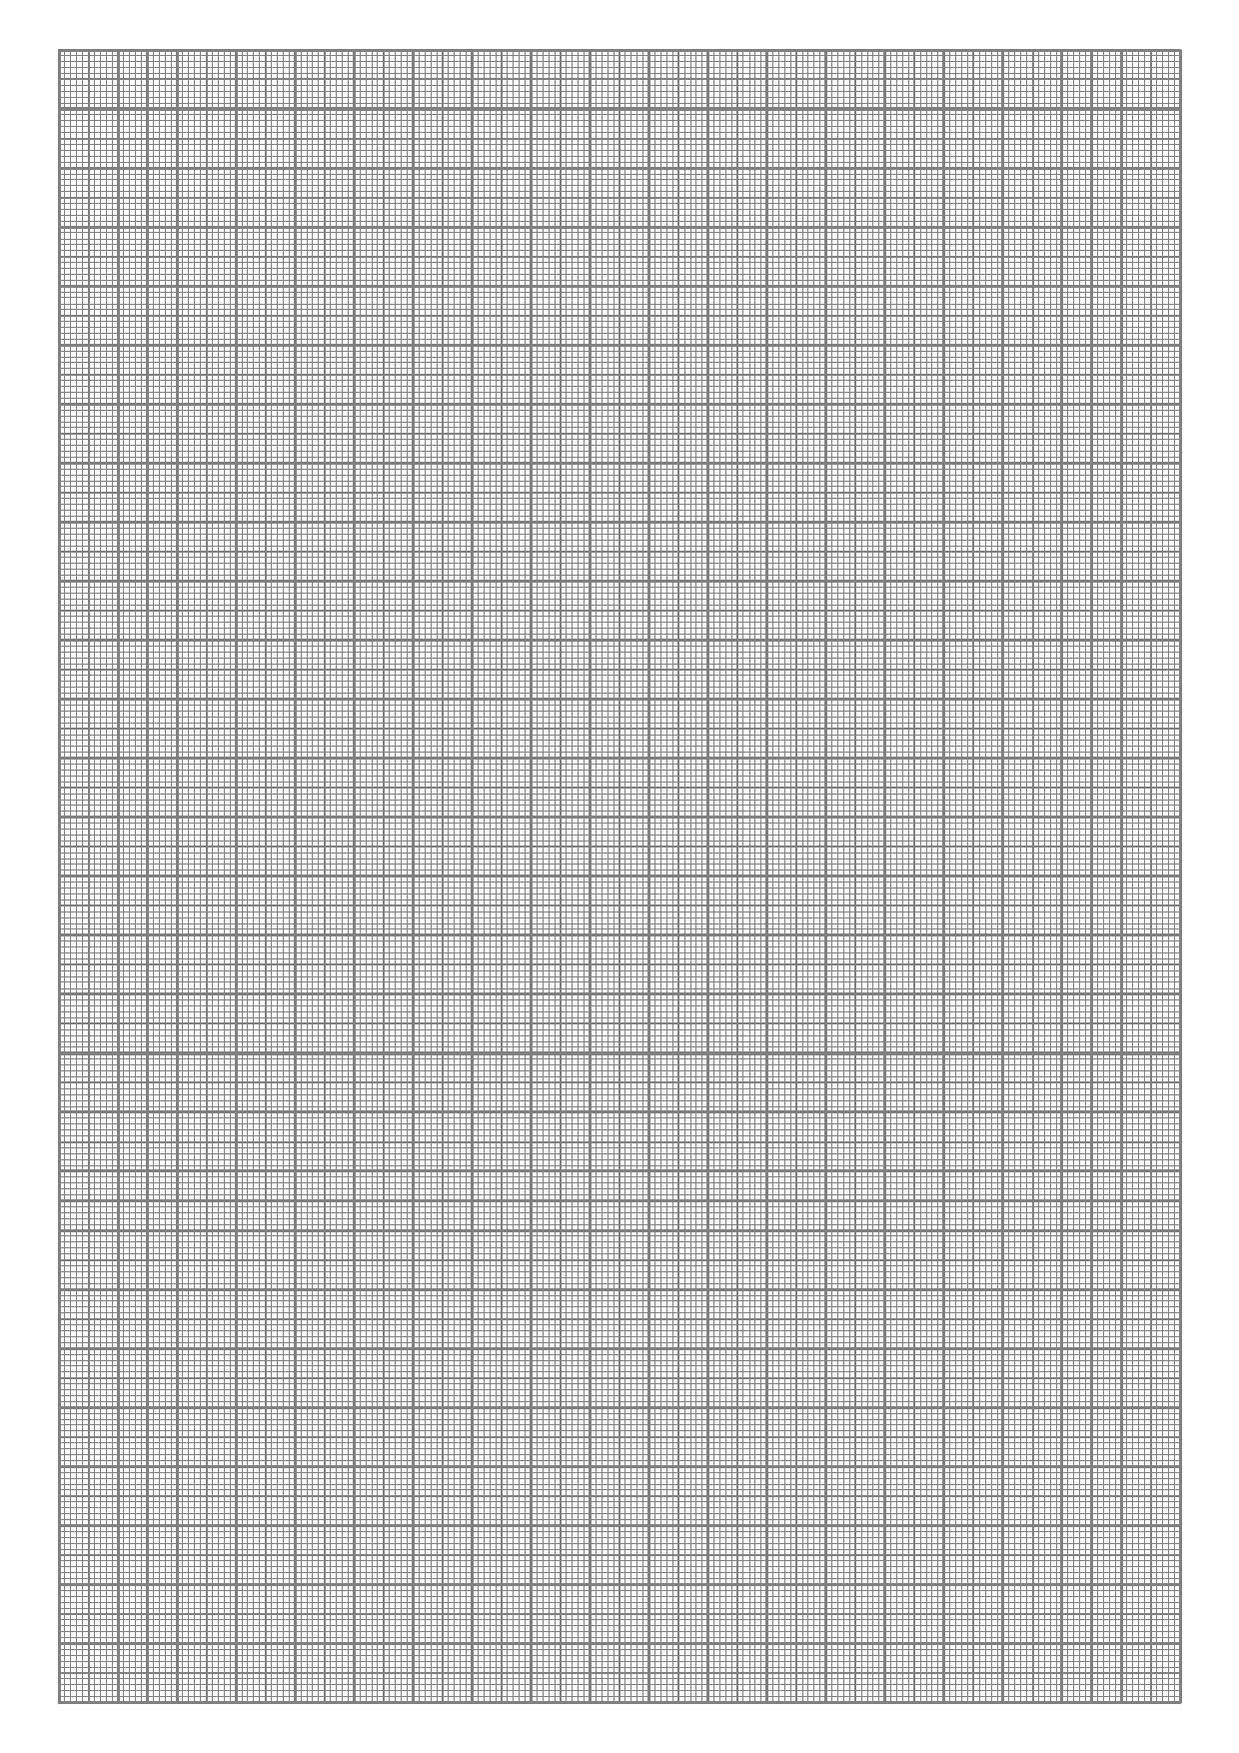 Premium Graph Paper Template